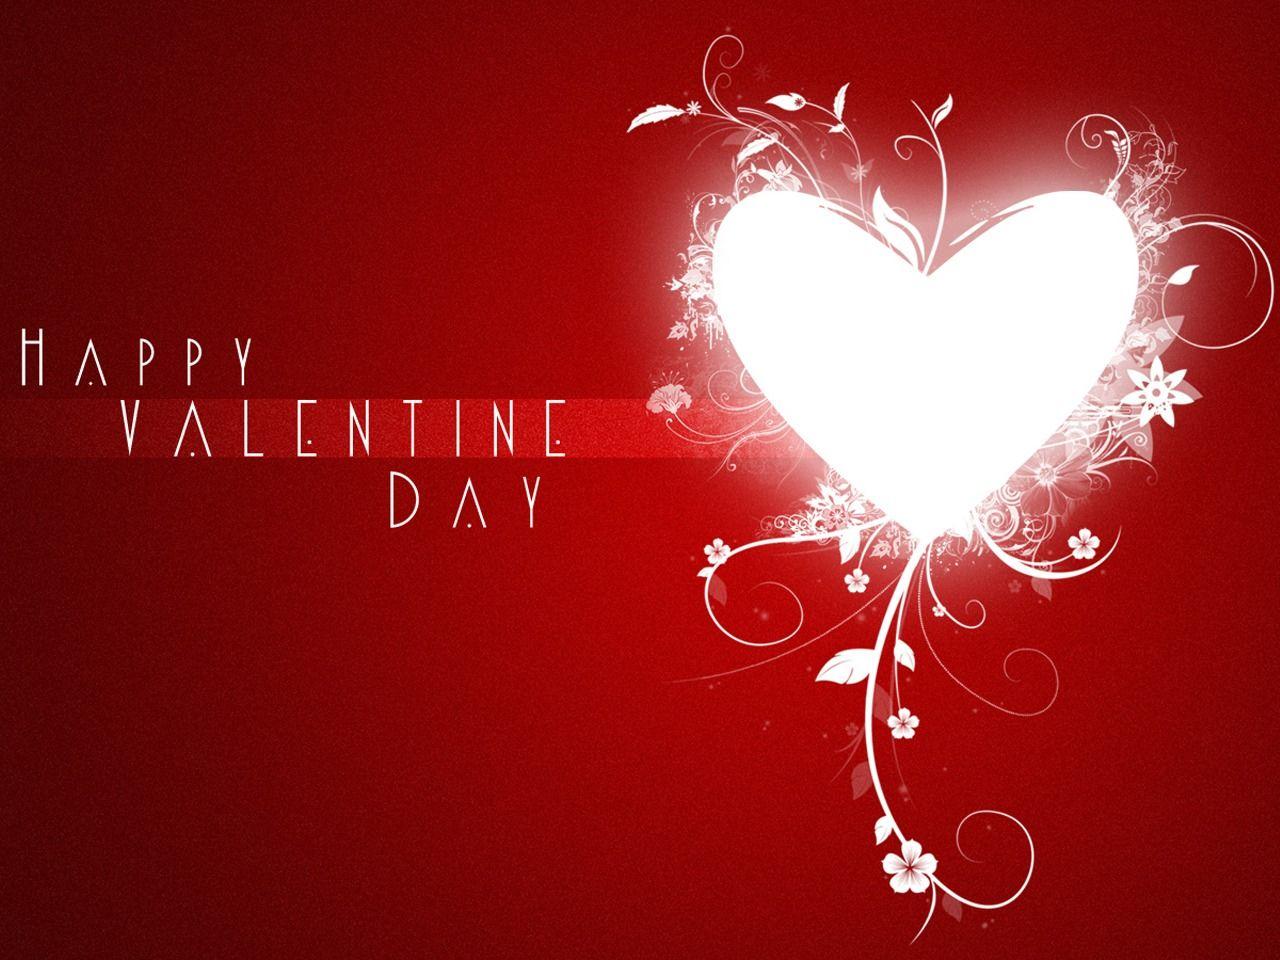 happy valentines day wallpaper 07 happy valentines day wallpaper 08 1280x960